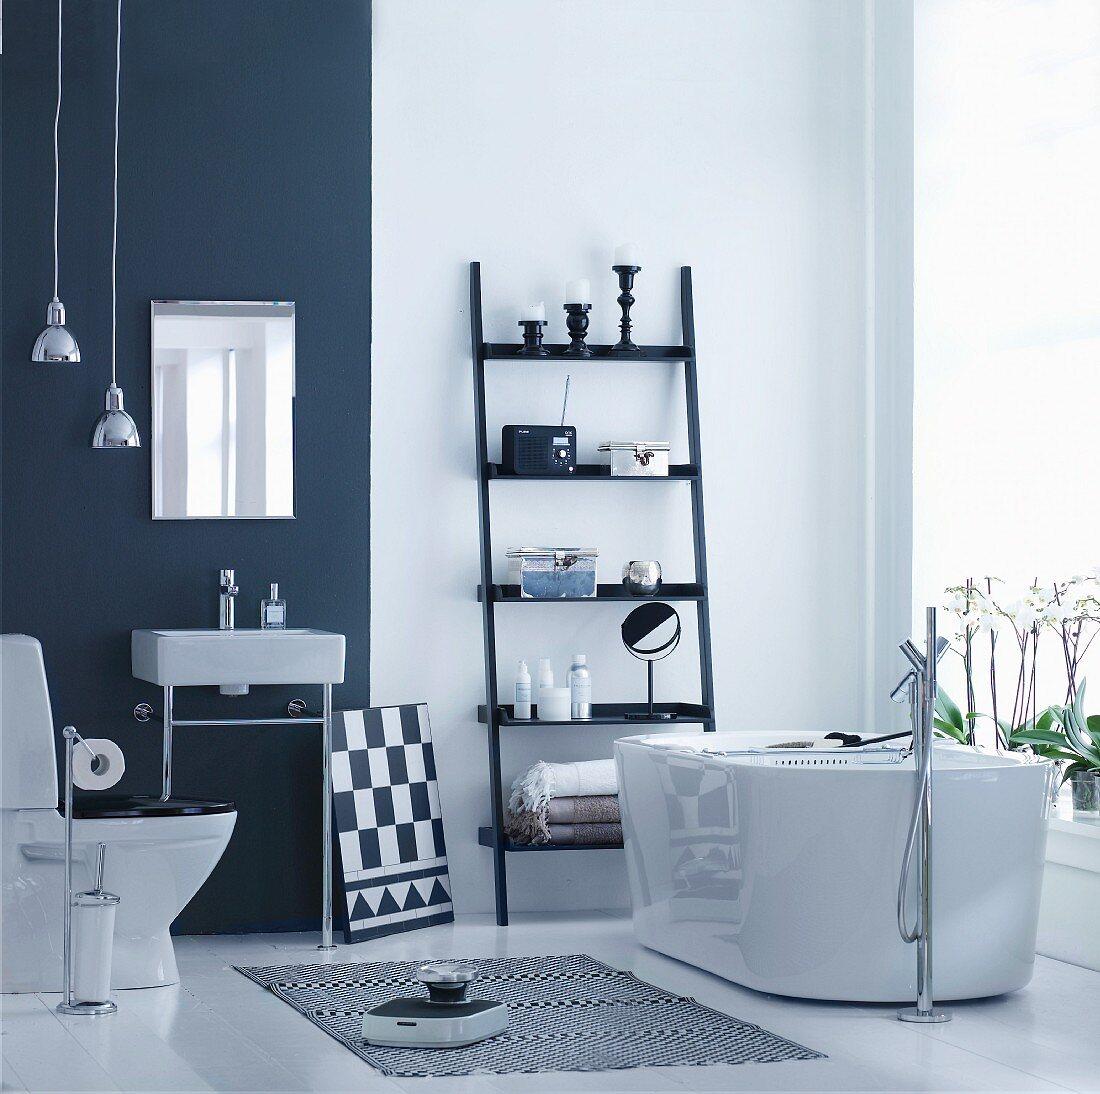 Black and white designer bathroom with free-standing bathtub